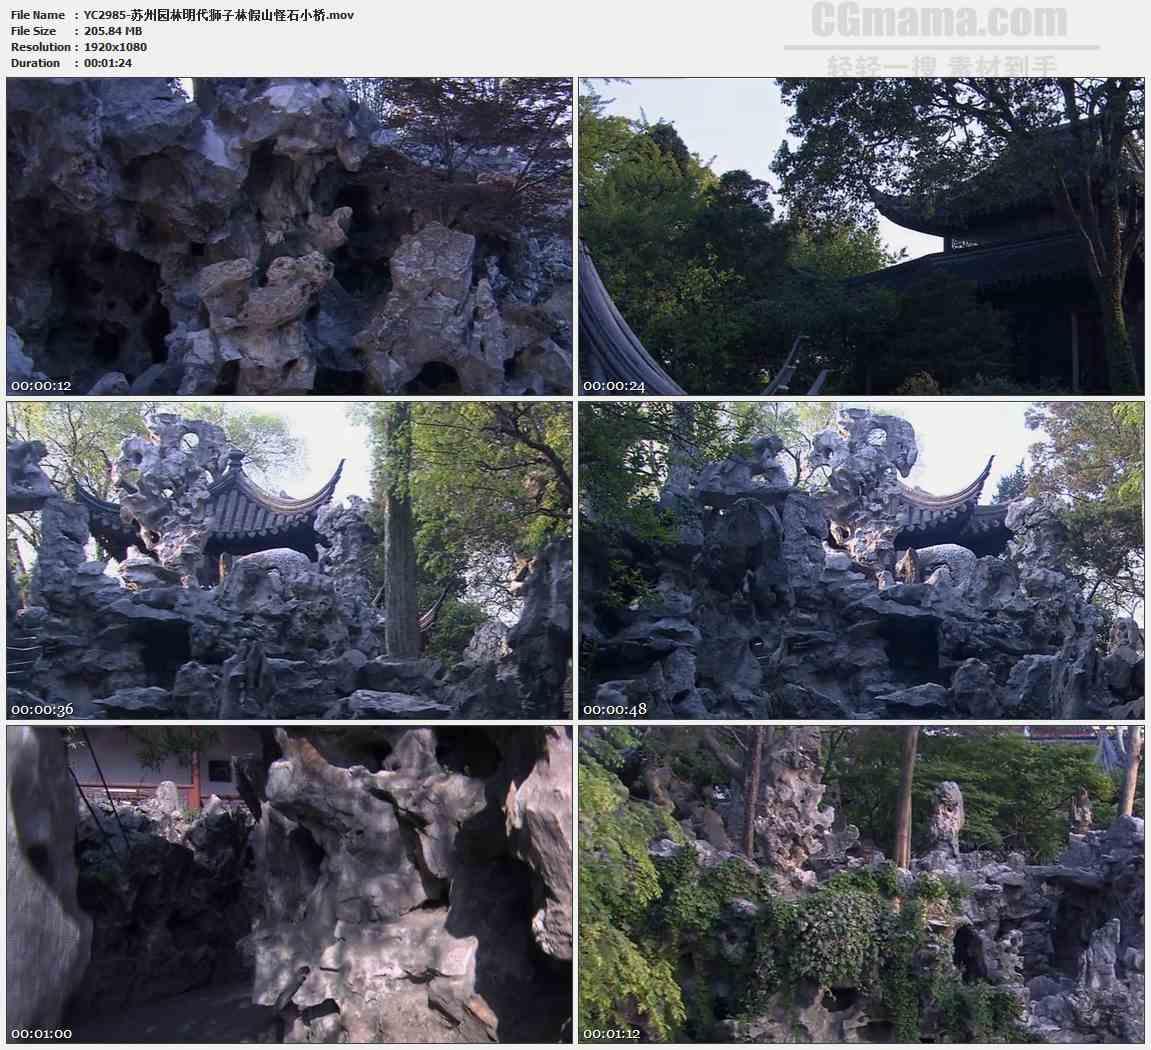 YC2985-苏州园林明代狮子林假山怪石小桥高清实拍视频素材